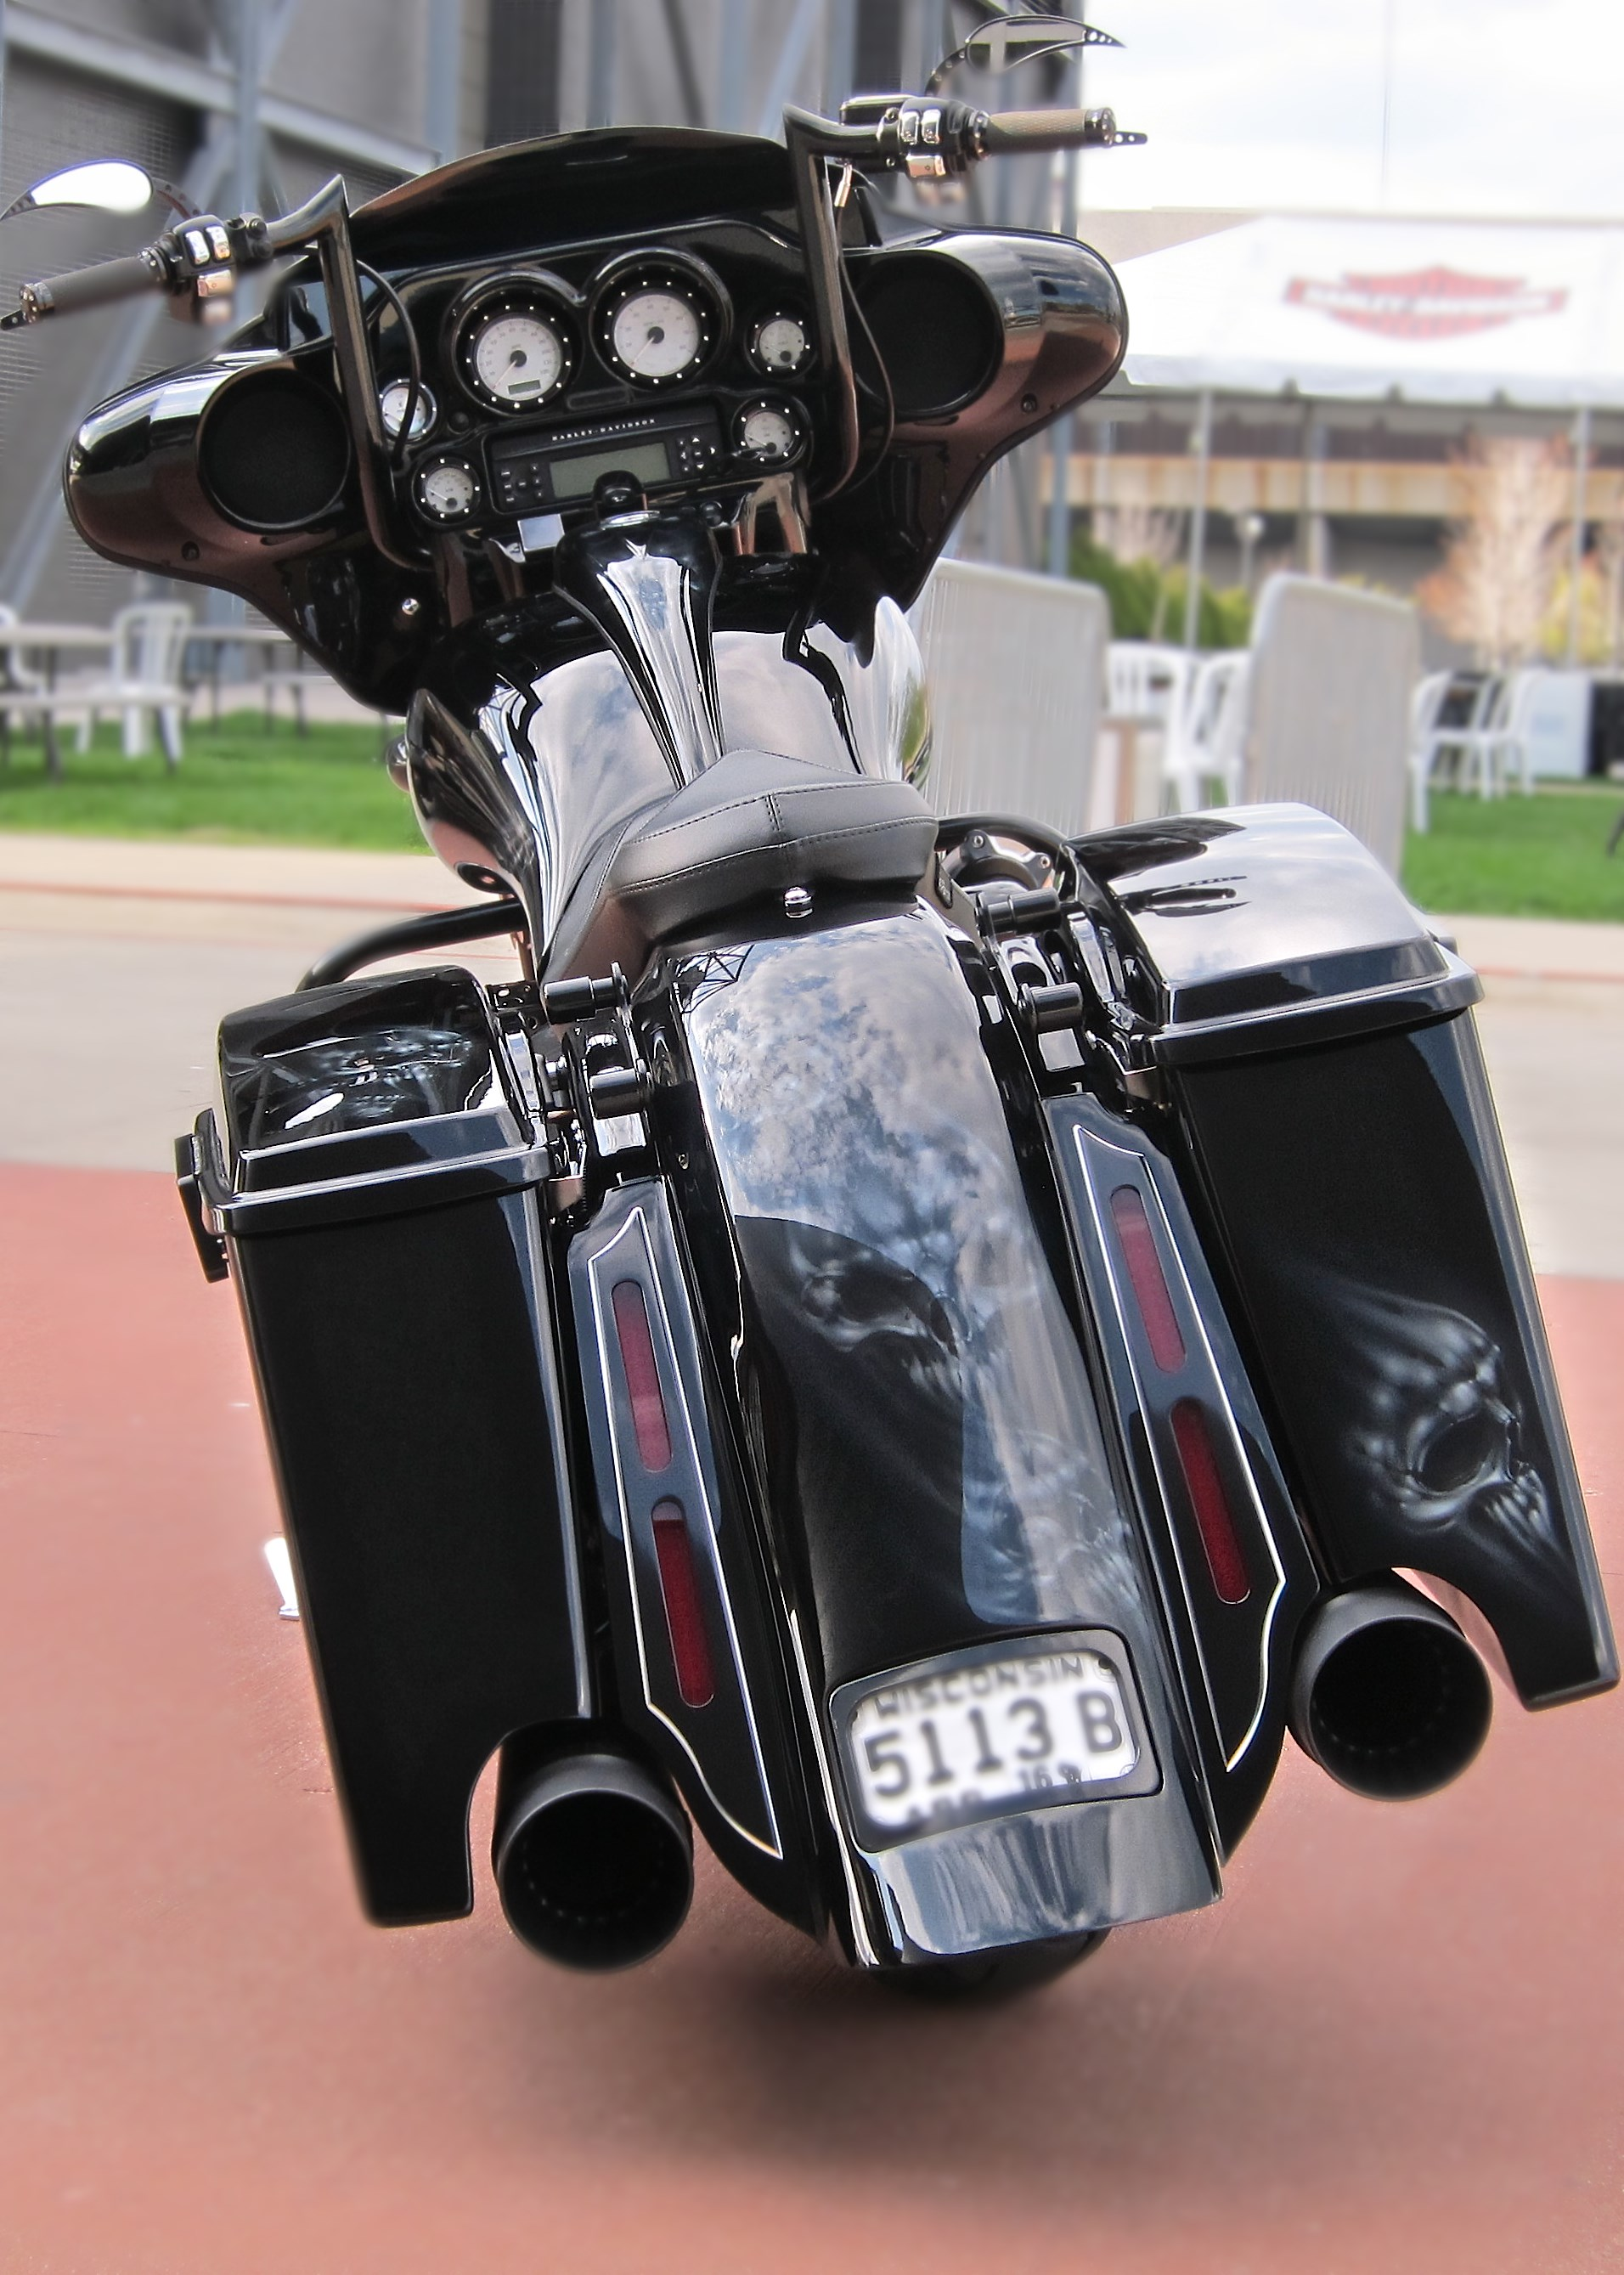 2009 Harley Davidson 174 Flhx Street Glide 174 Black